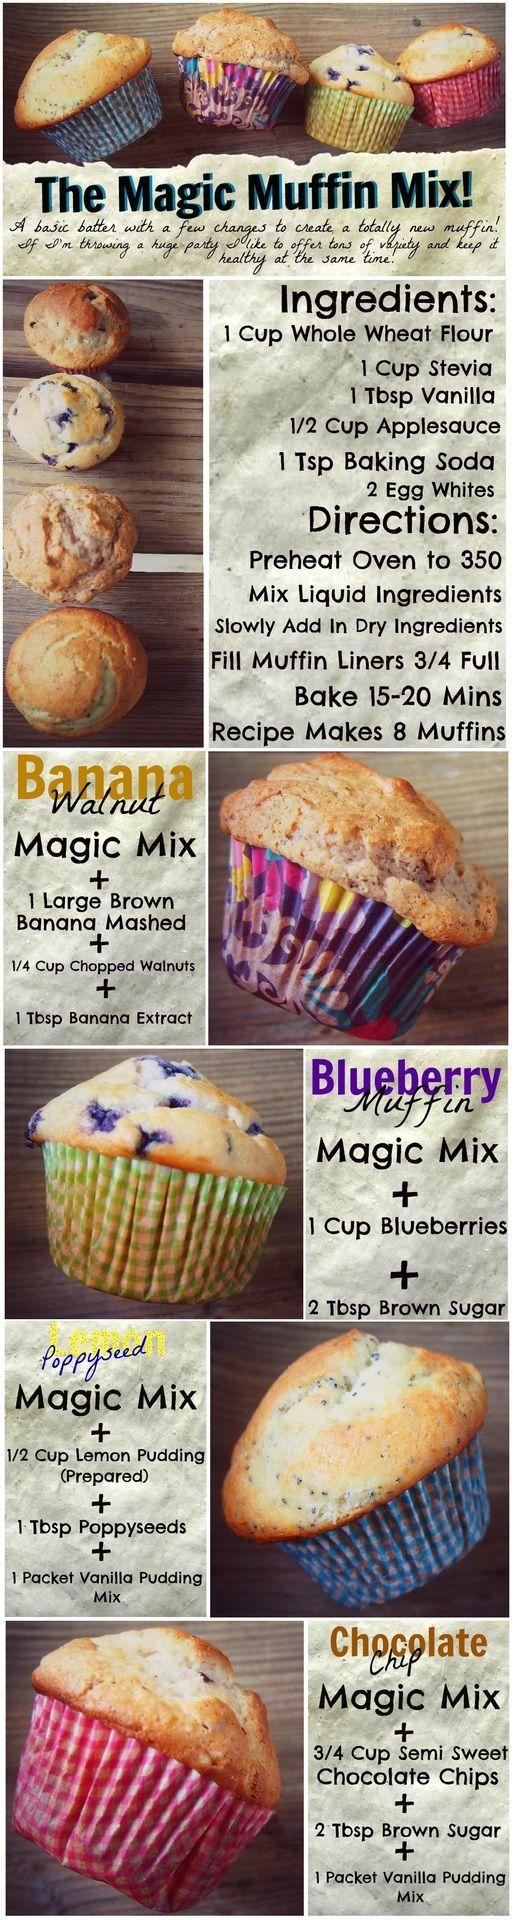 DIY Muffin Recipe baking recipe recipes ingredients instructions desert recipes easy recipes appetizers snacks easy recipe recipe ideas breakfast recipe